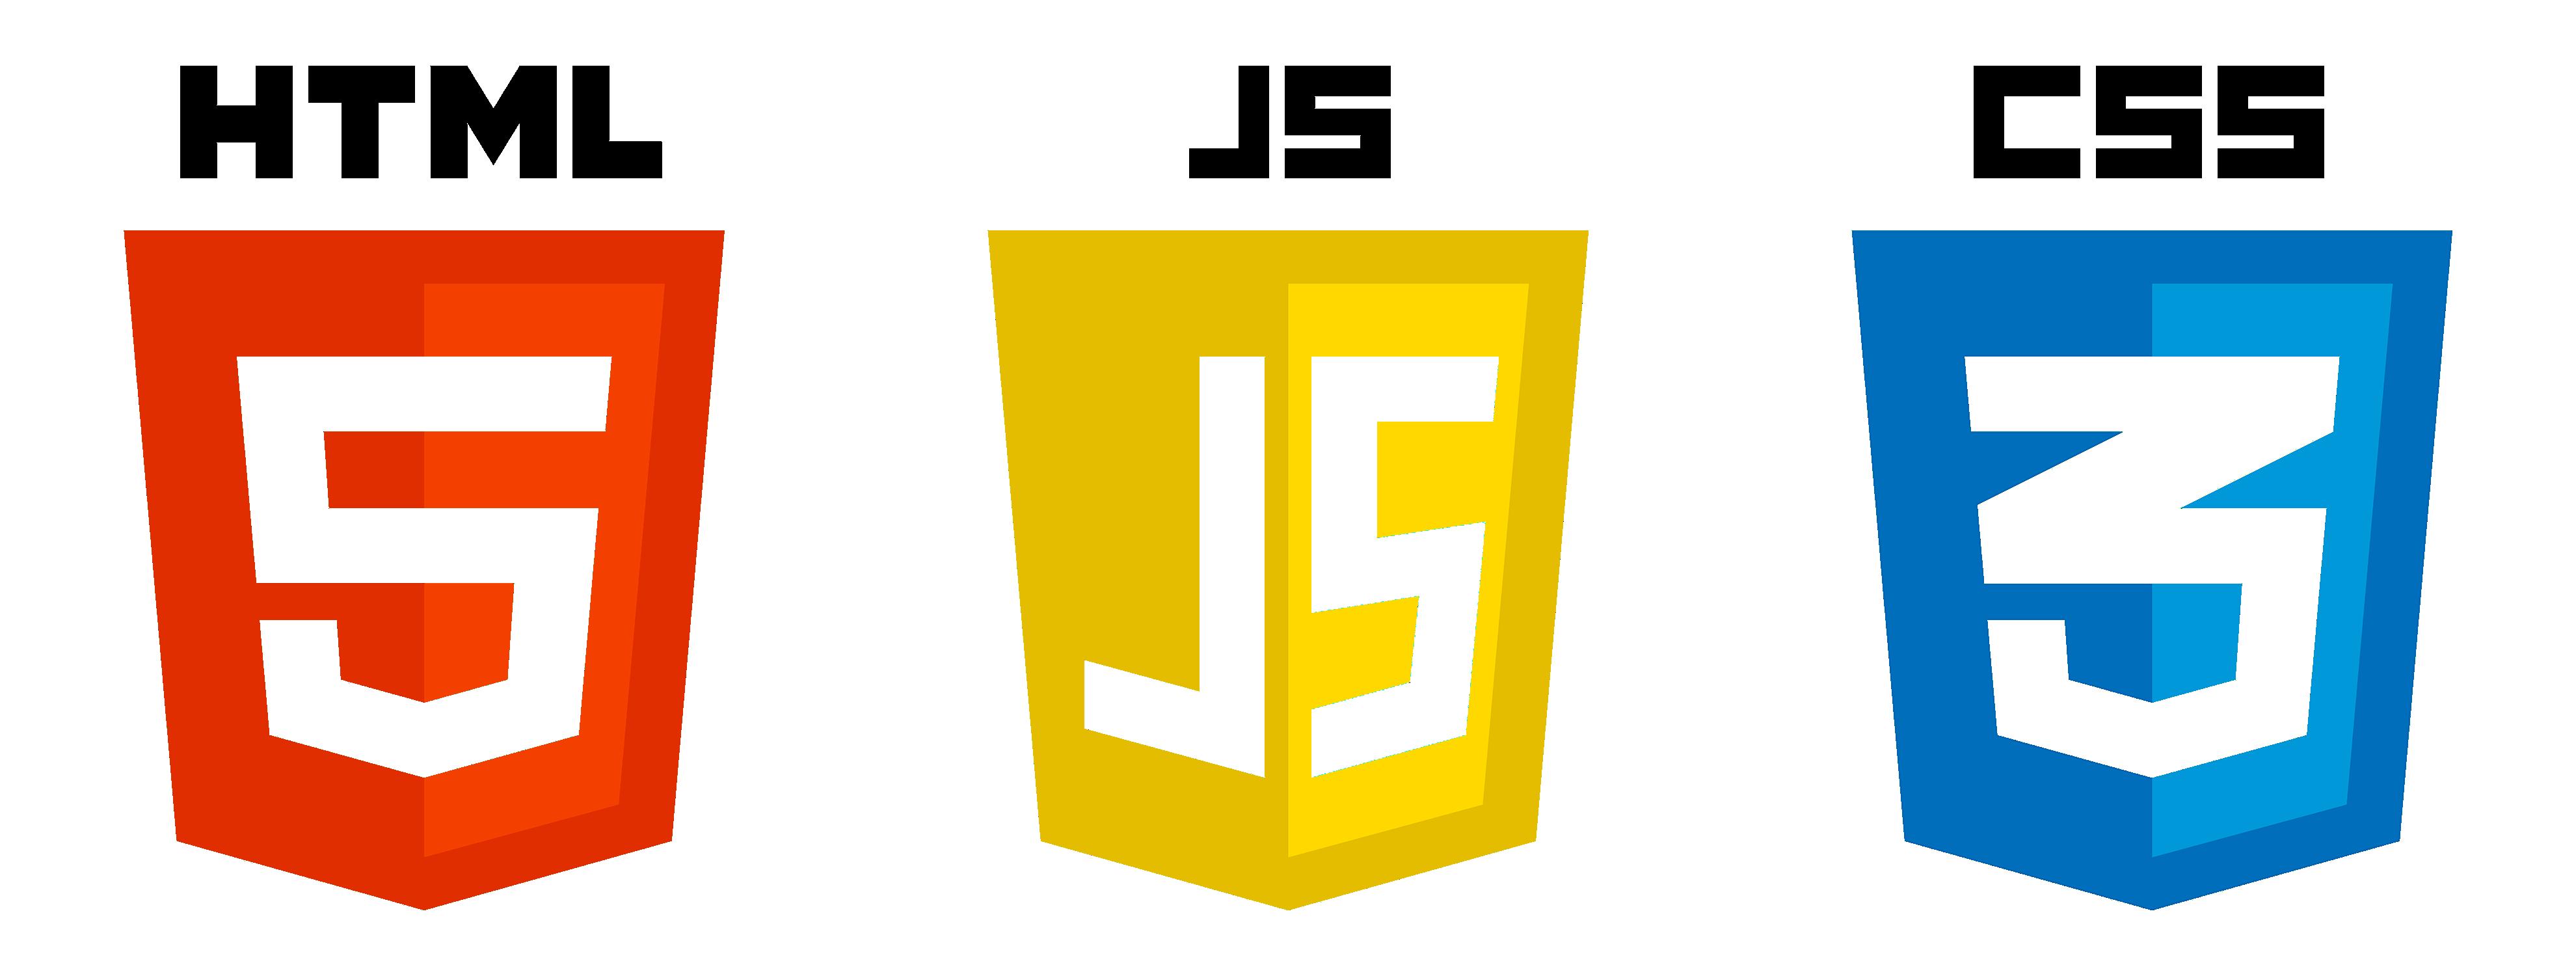 Html5 Js Css3 Logo Png.